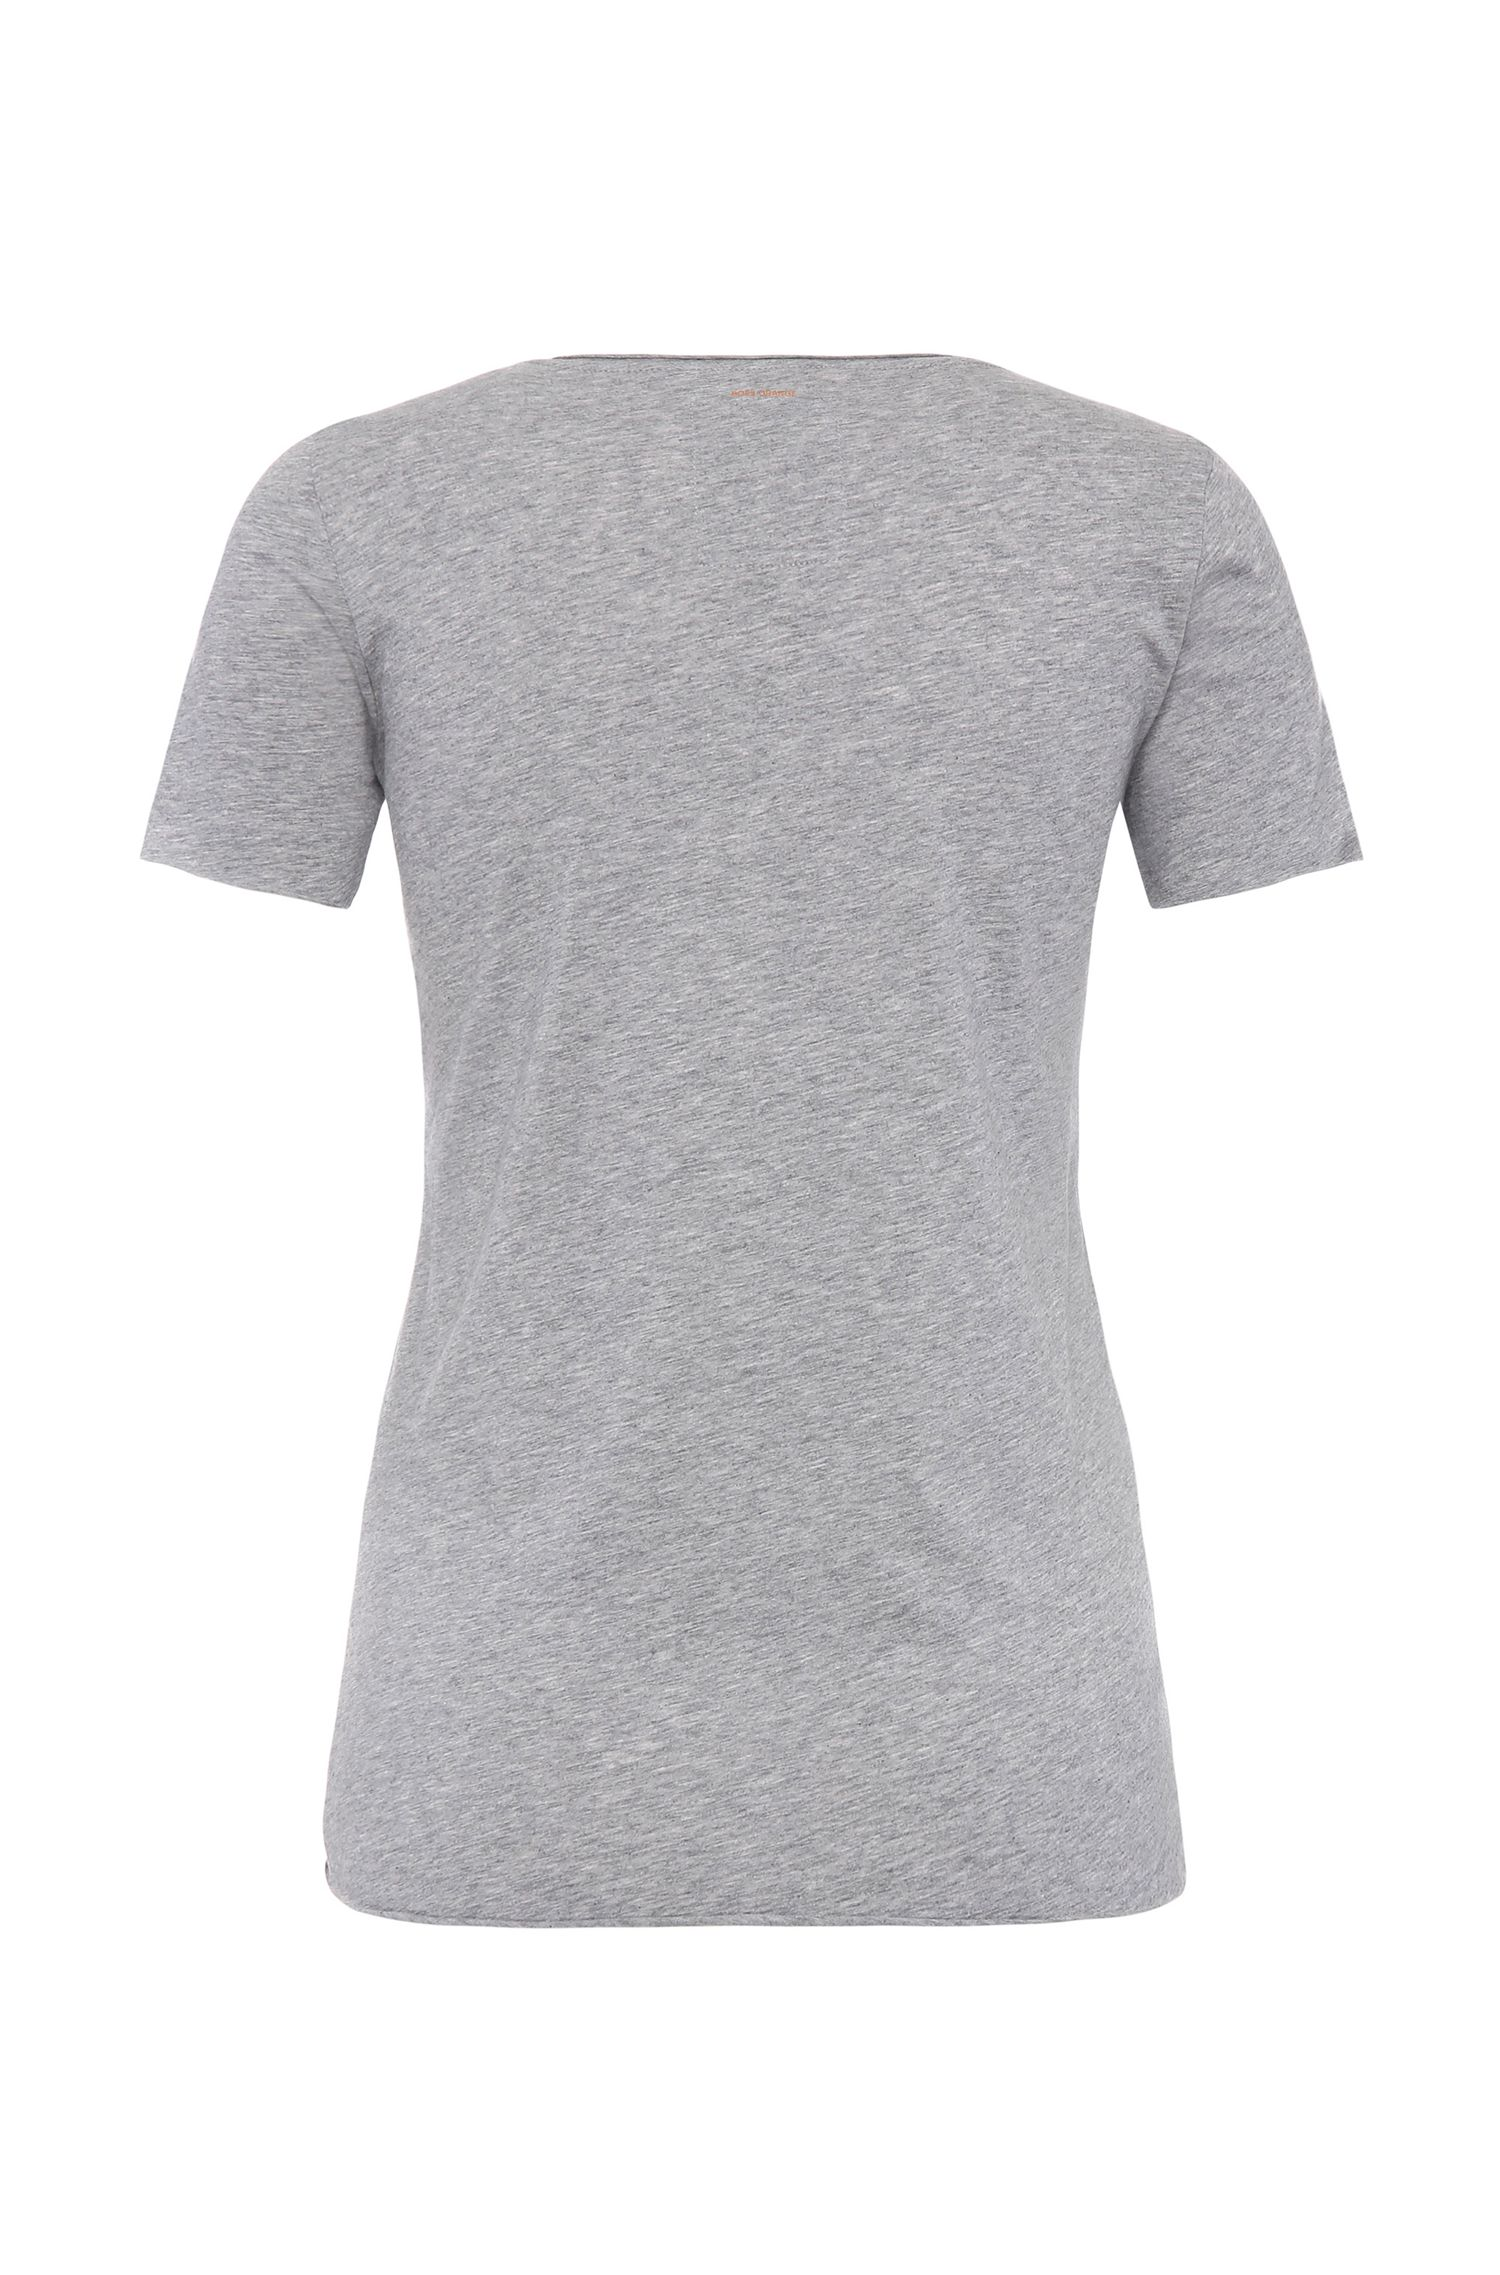 Slim-Fit Baumwollshirt mit grafischem Print: ´Tishirt`